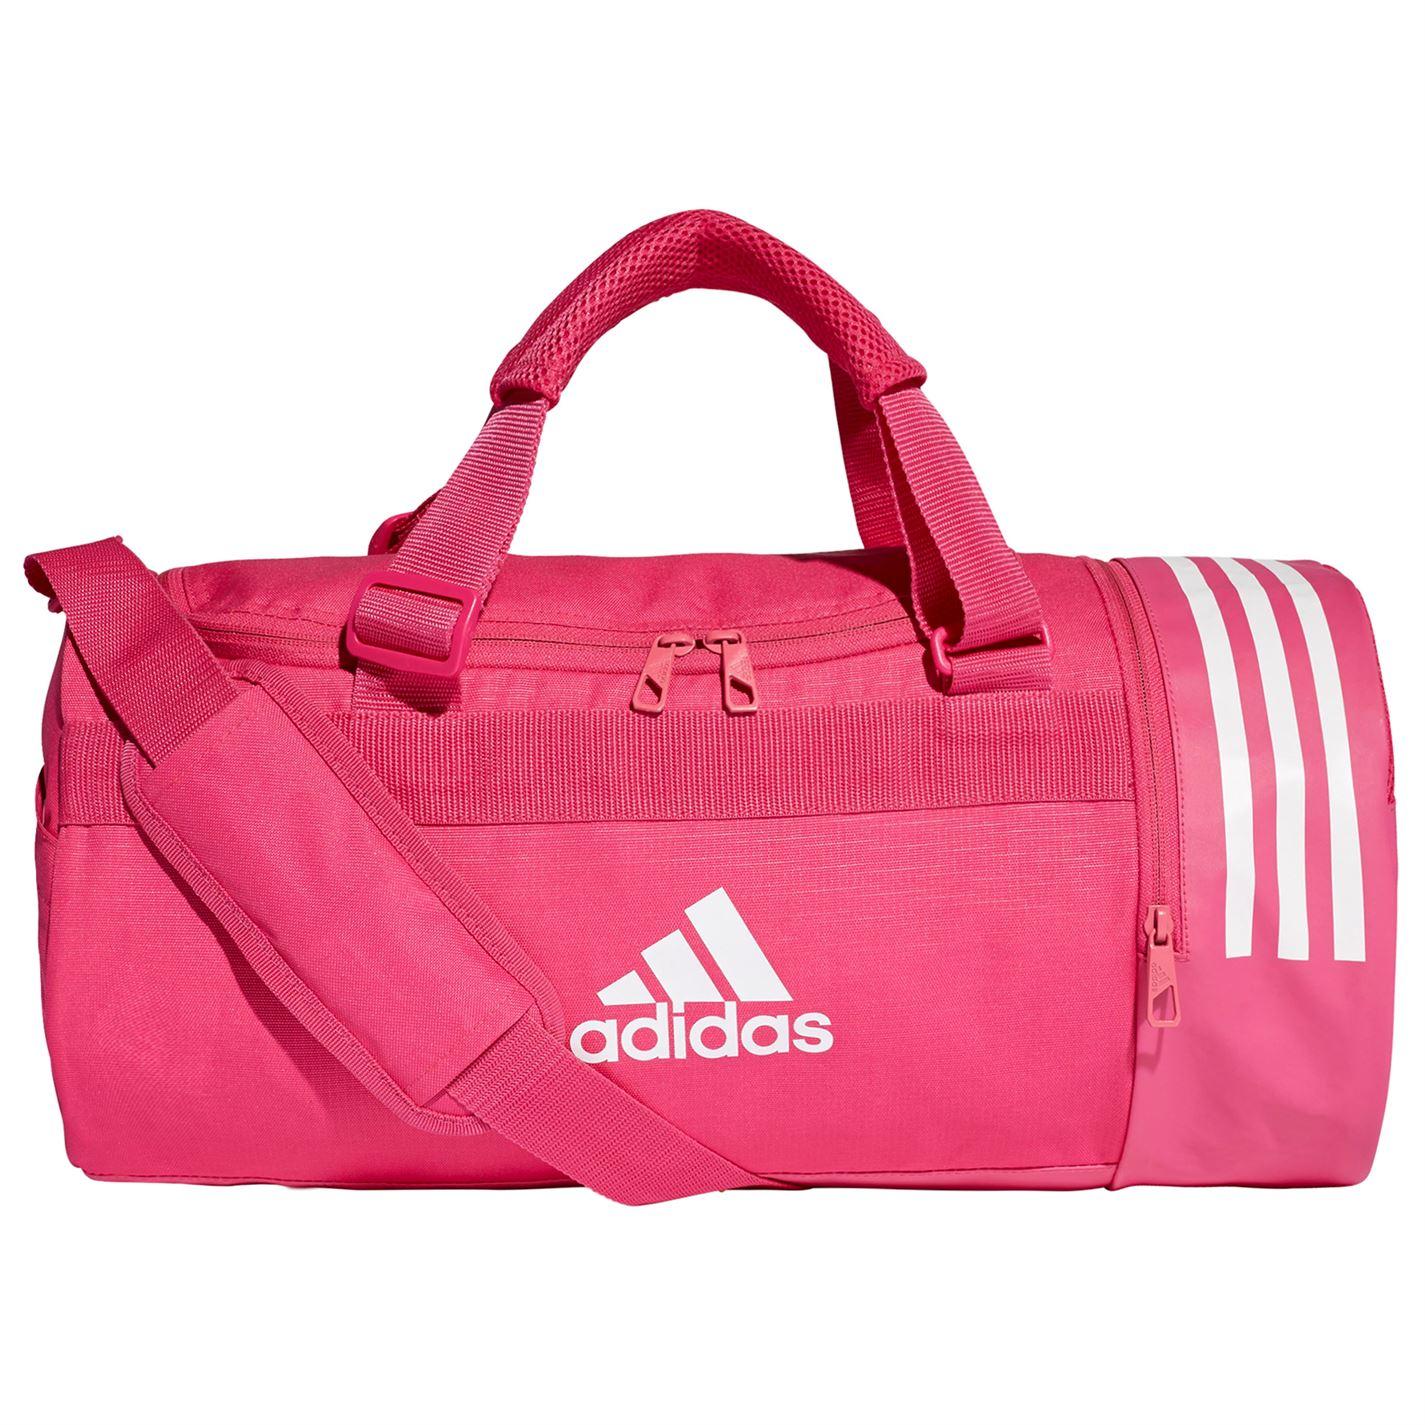 Adidas Convertible 3-Stripes Duffel Bag Small